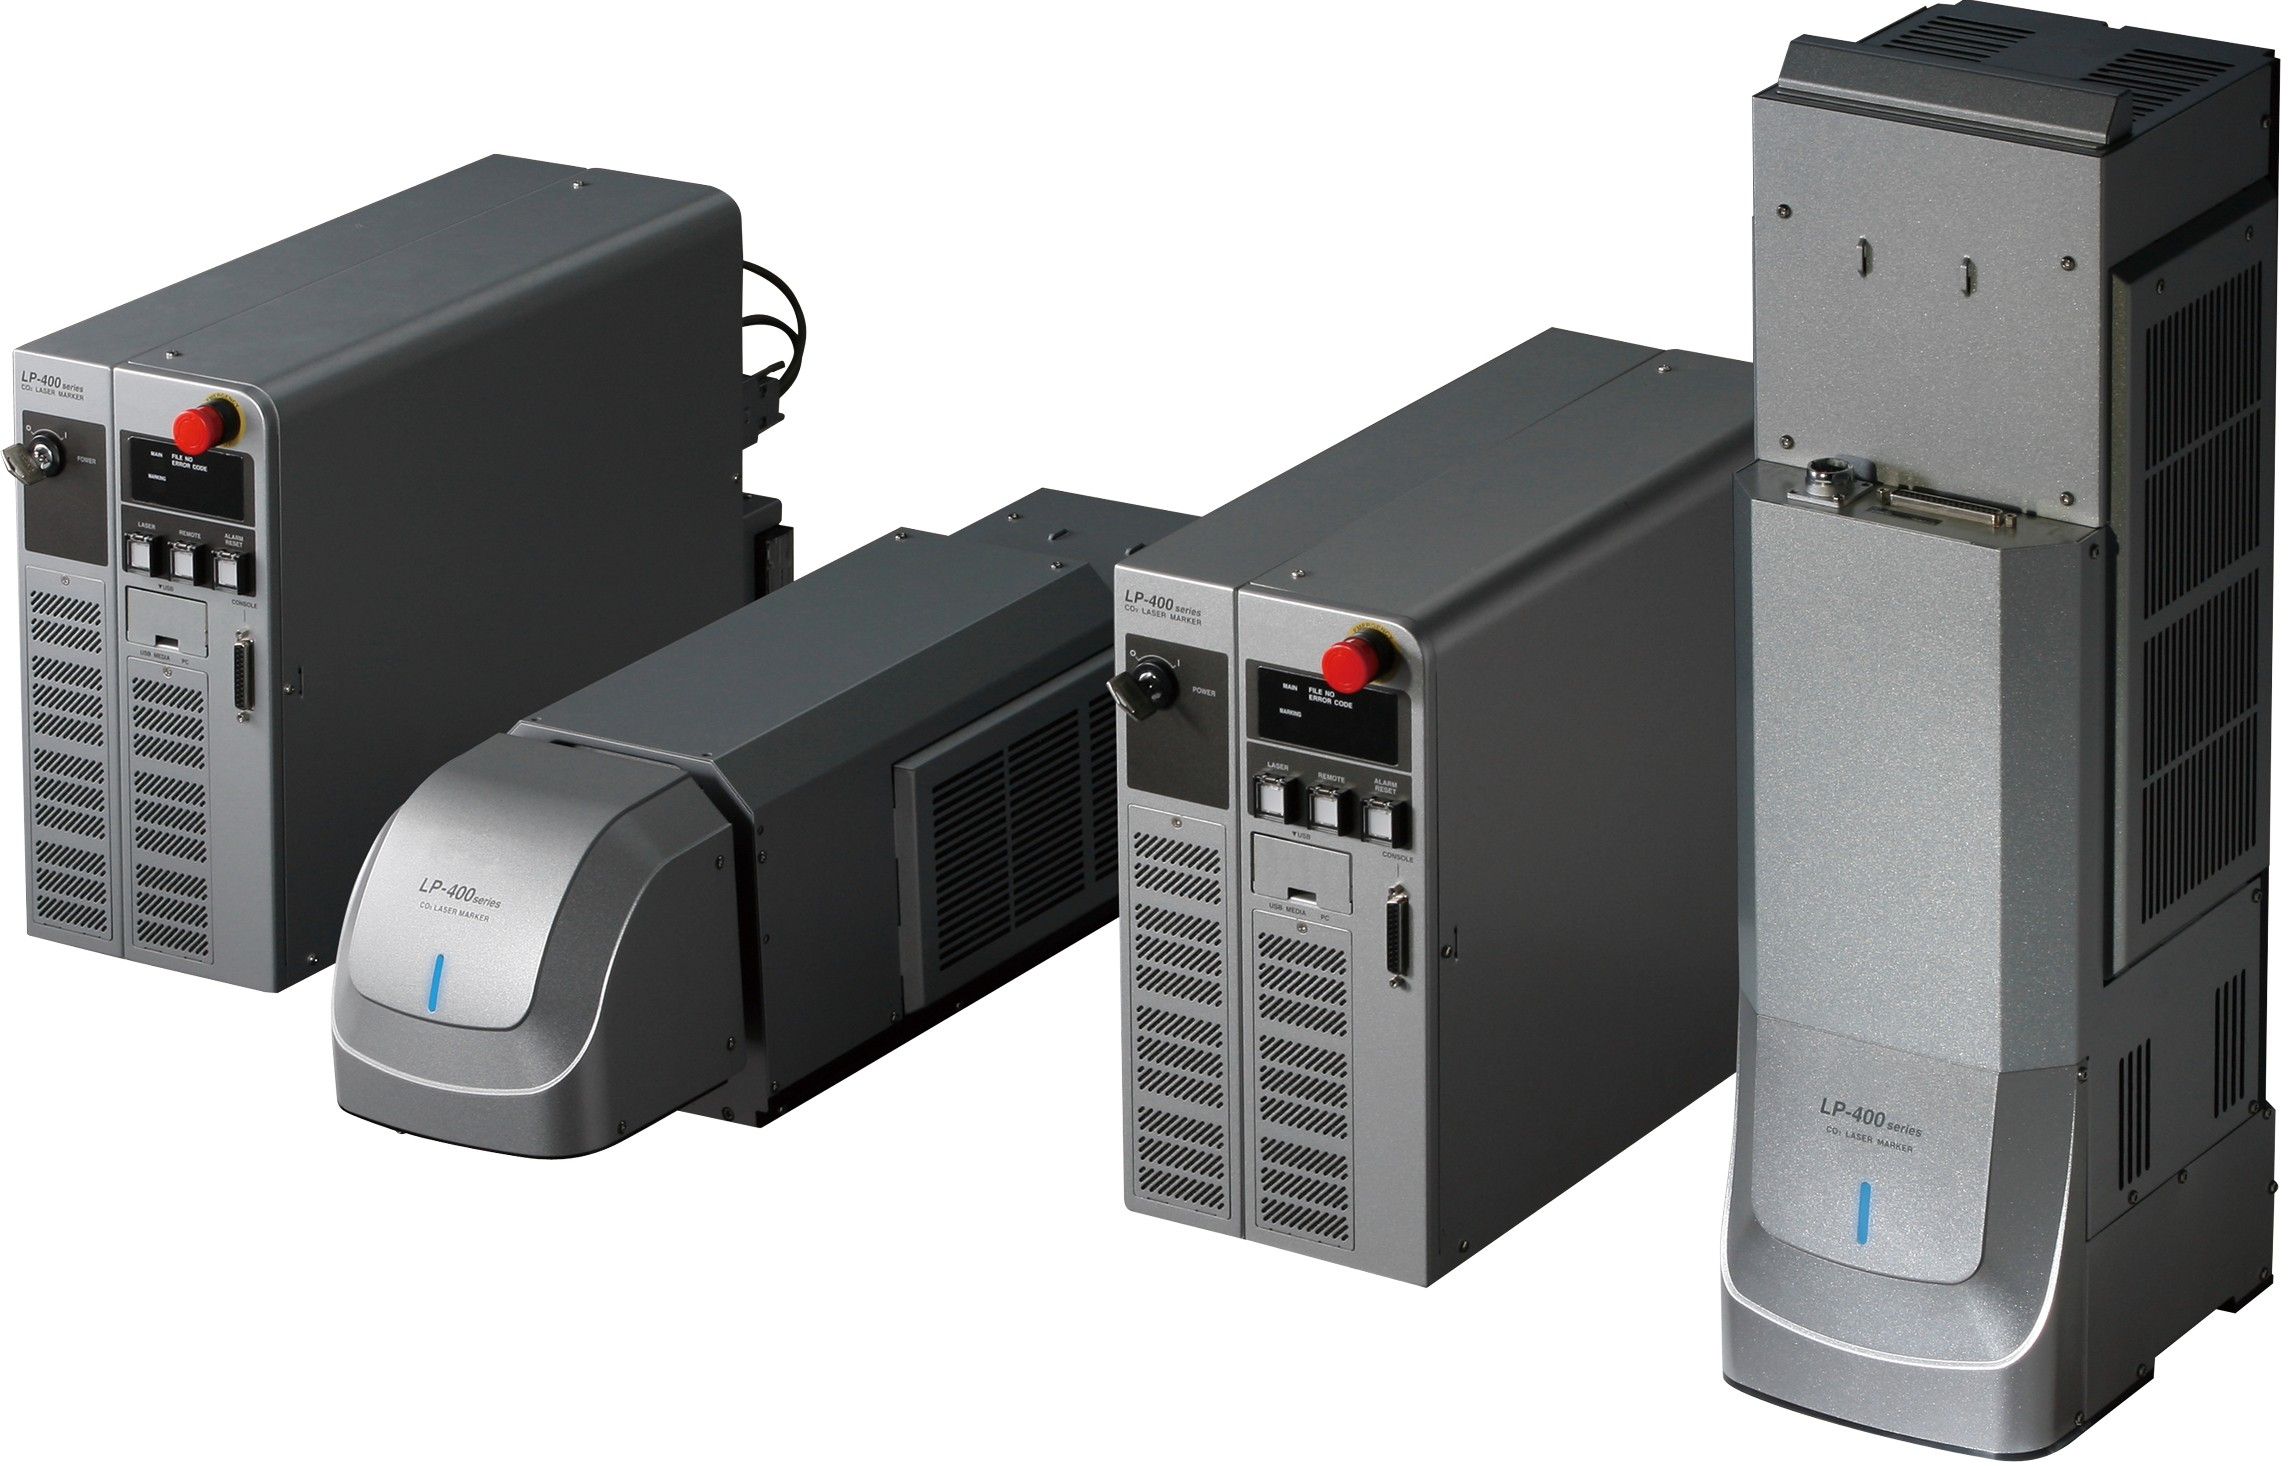 LP-400